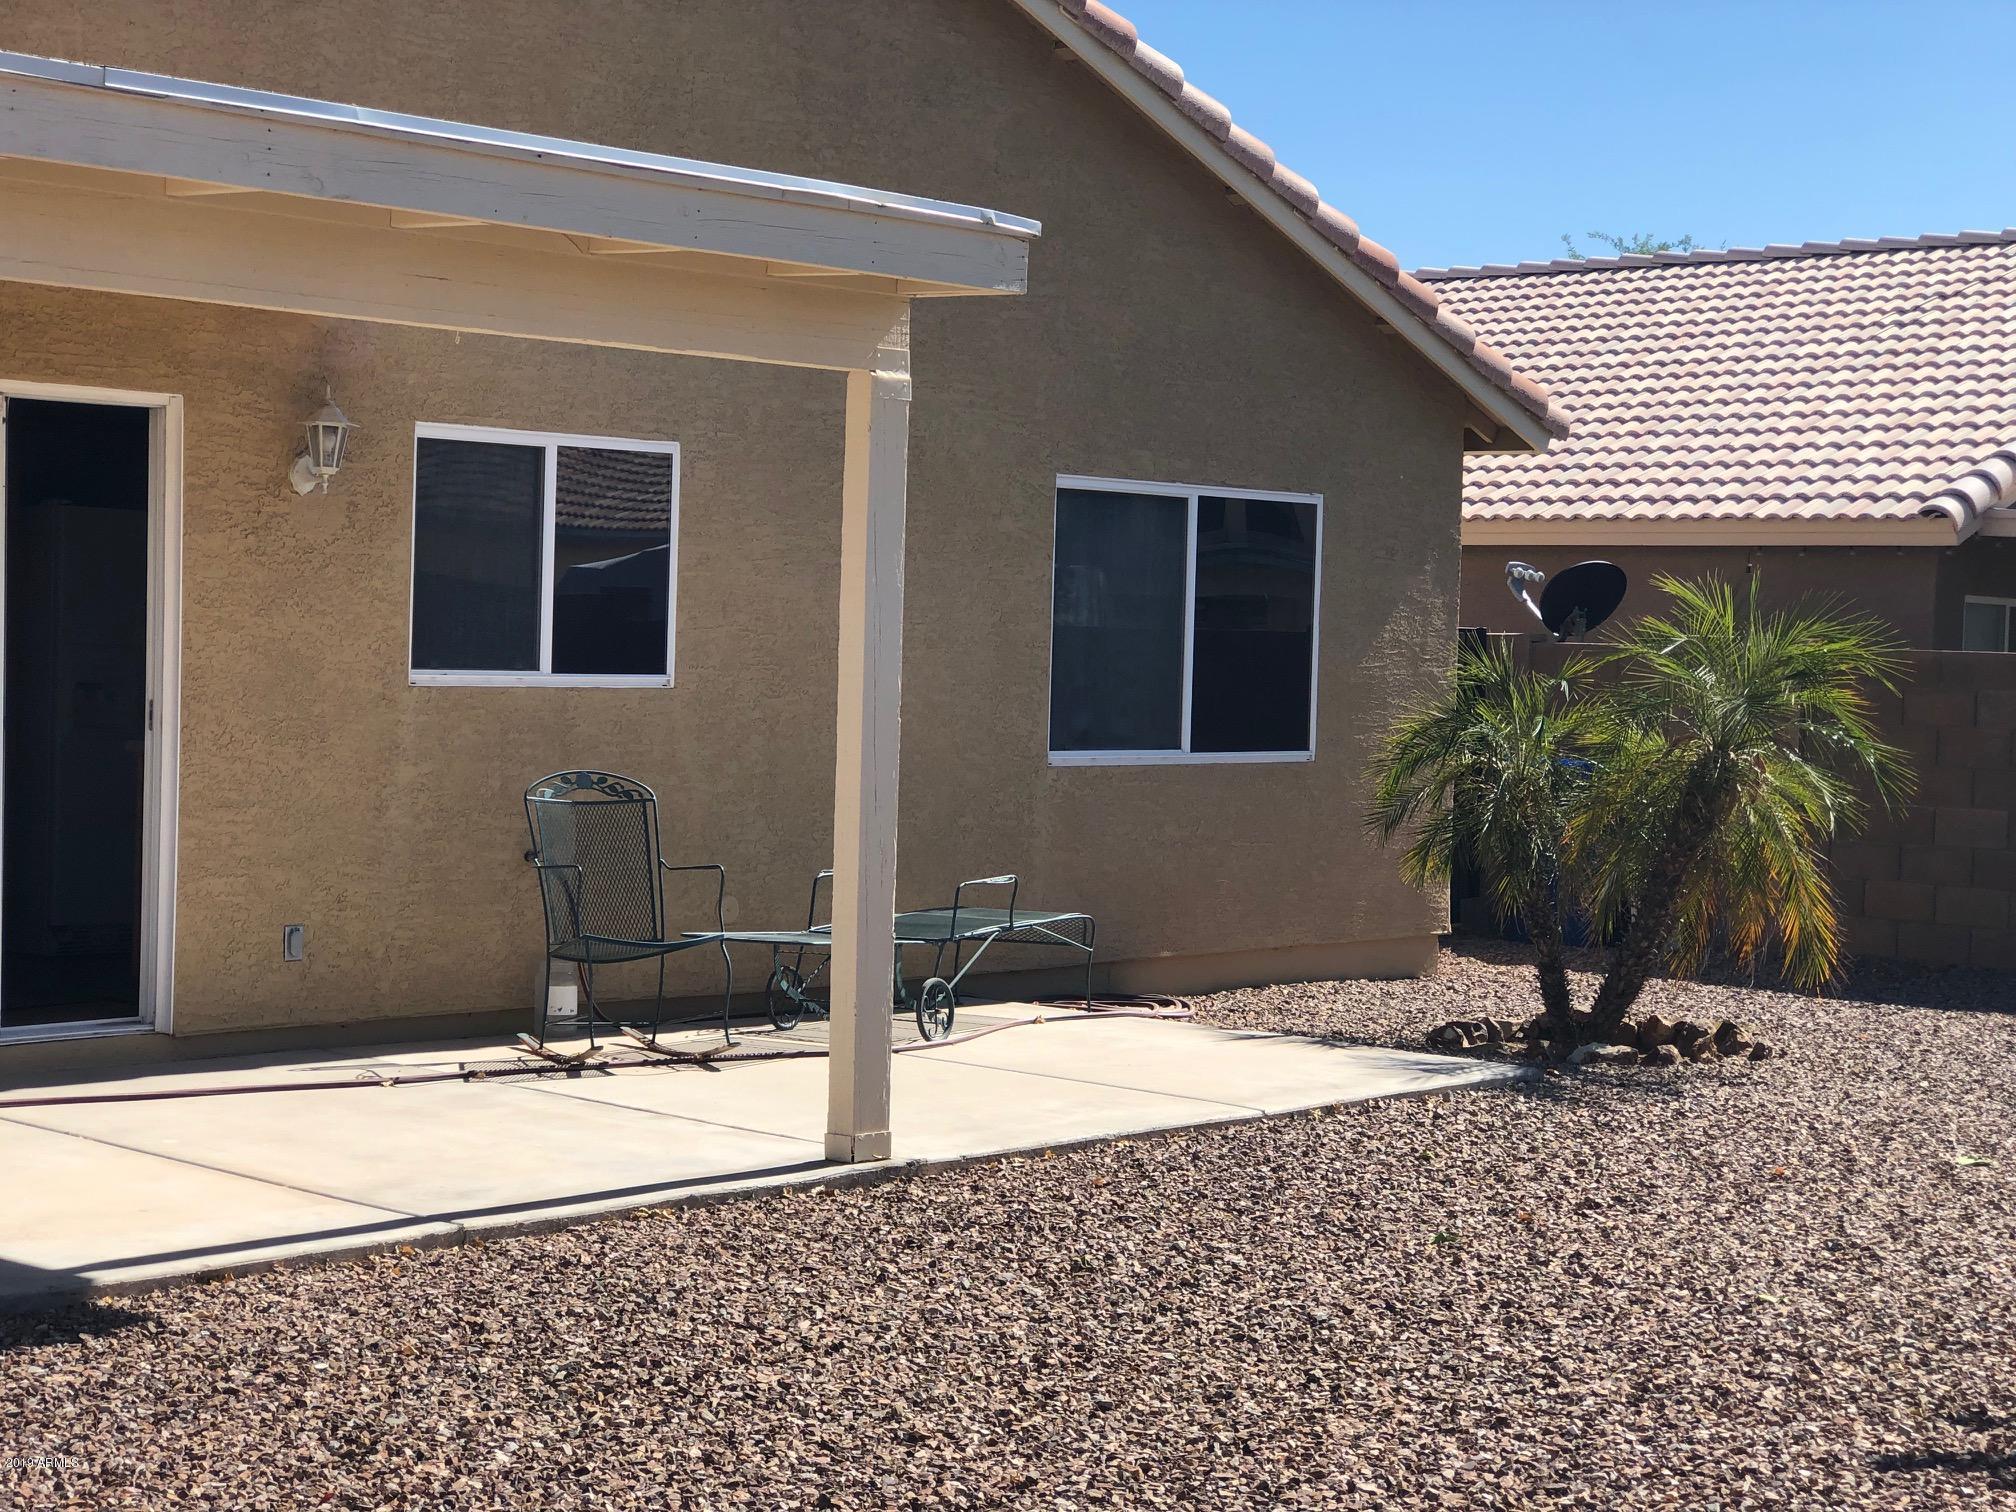 Photo of 11442 E COVINA Street, Mesa, AZ 85207